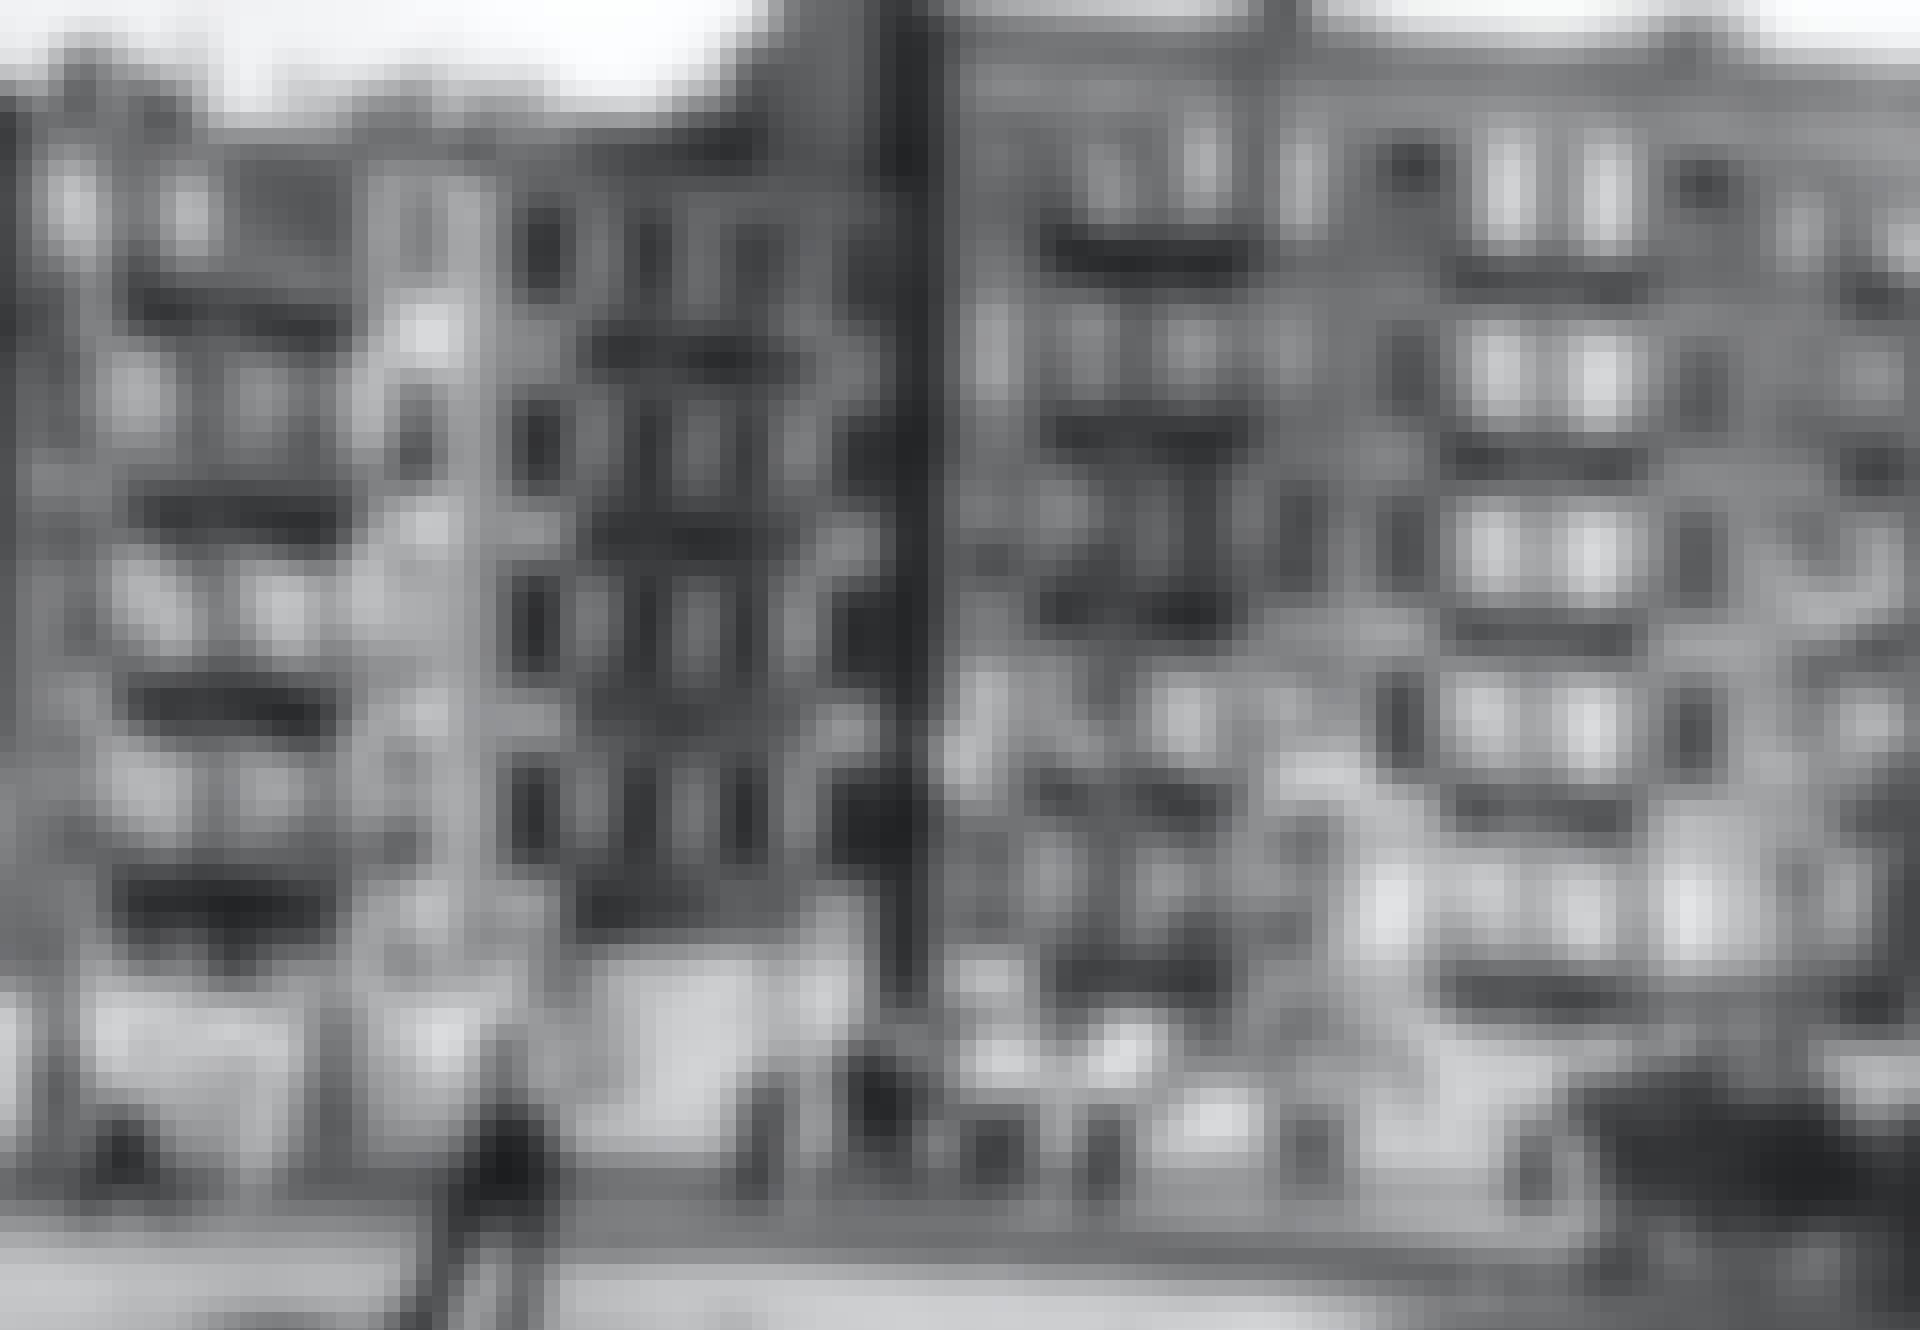 Manhattan brick buildings